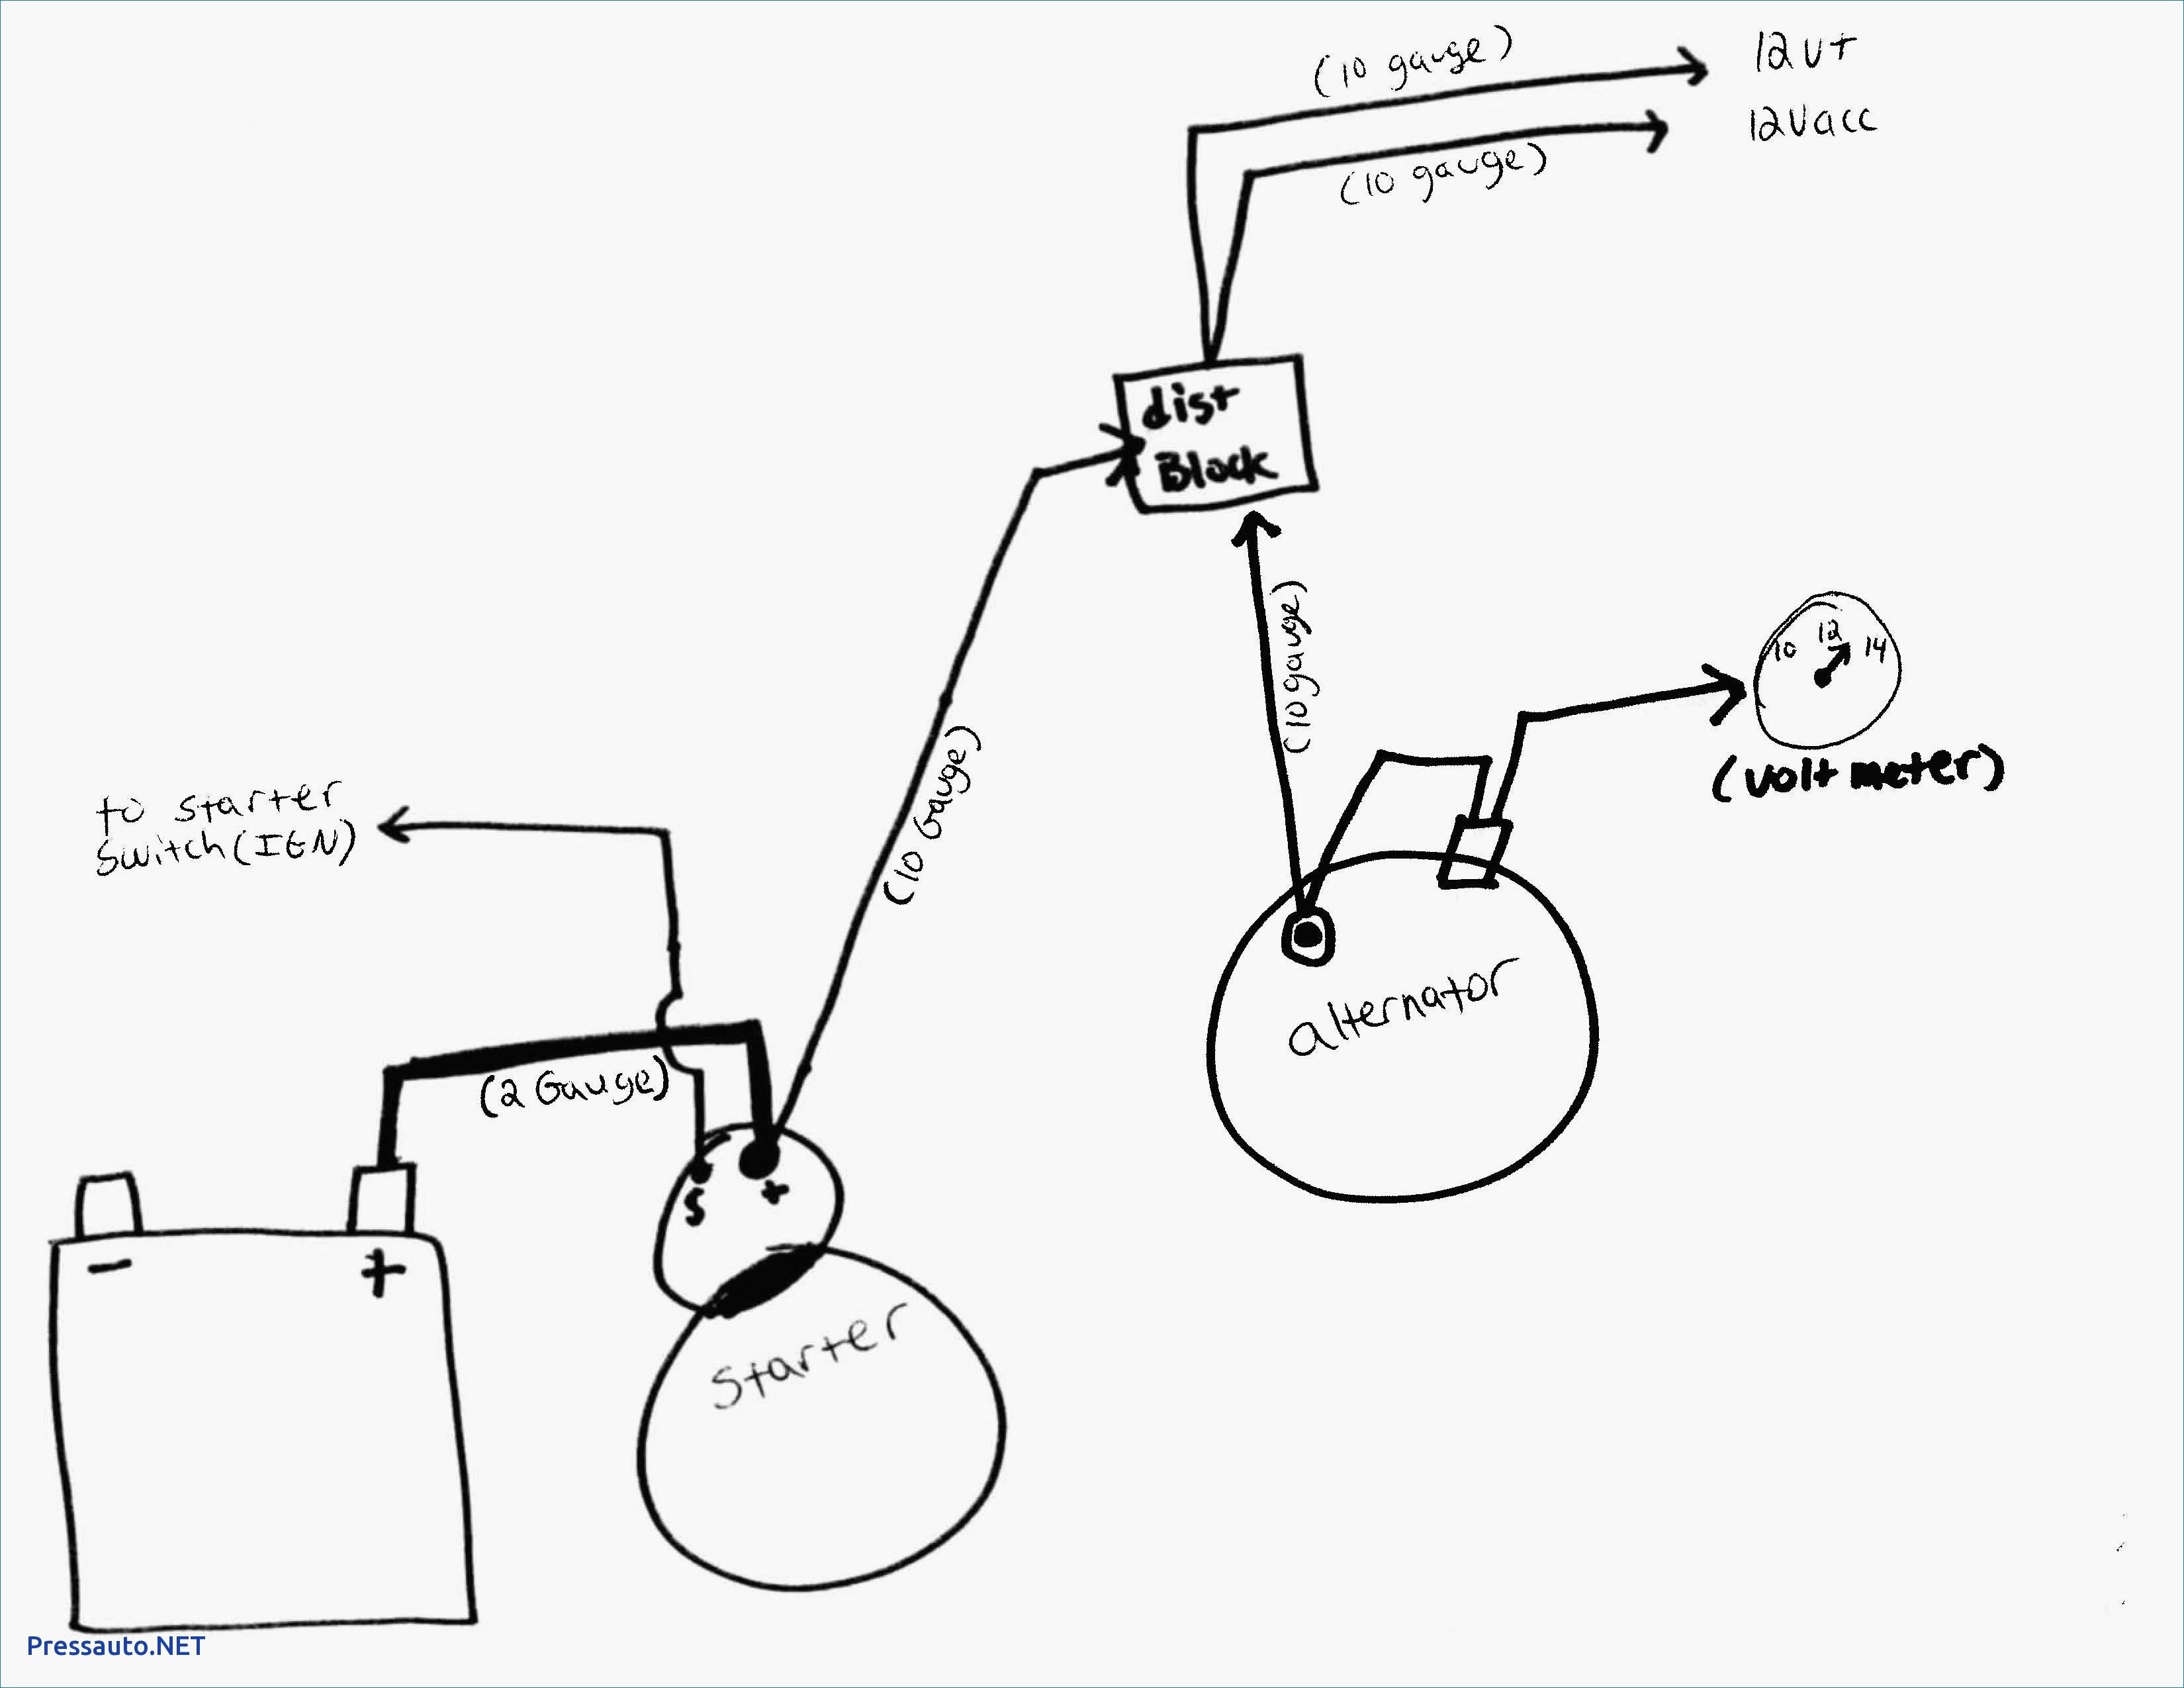 Iskra Alternator Wiring Diagram Best iskra Alternator Wiring Diagram Everything You Need Of Iskra Alternator Wiring Diagram